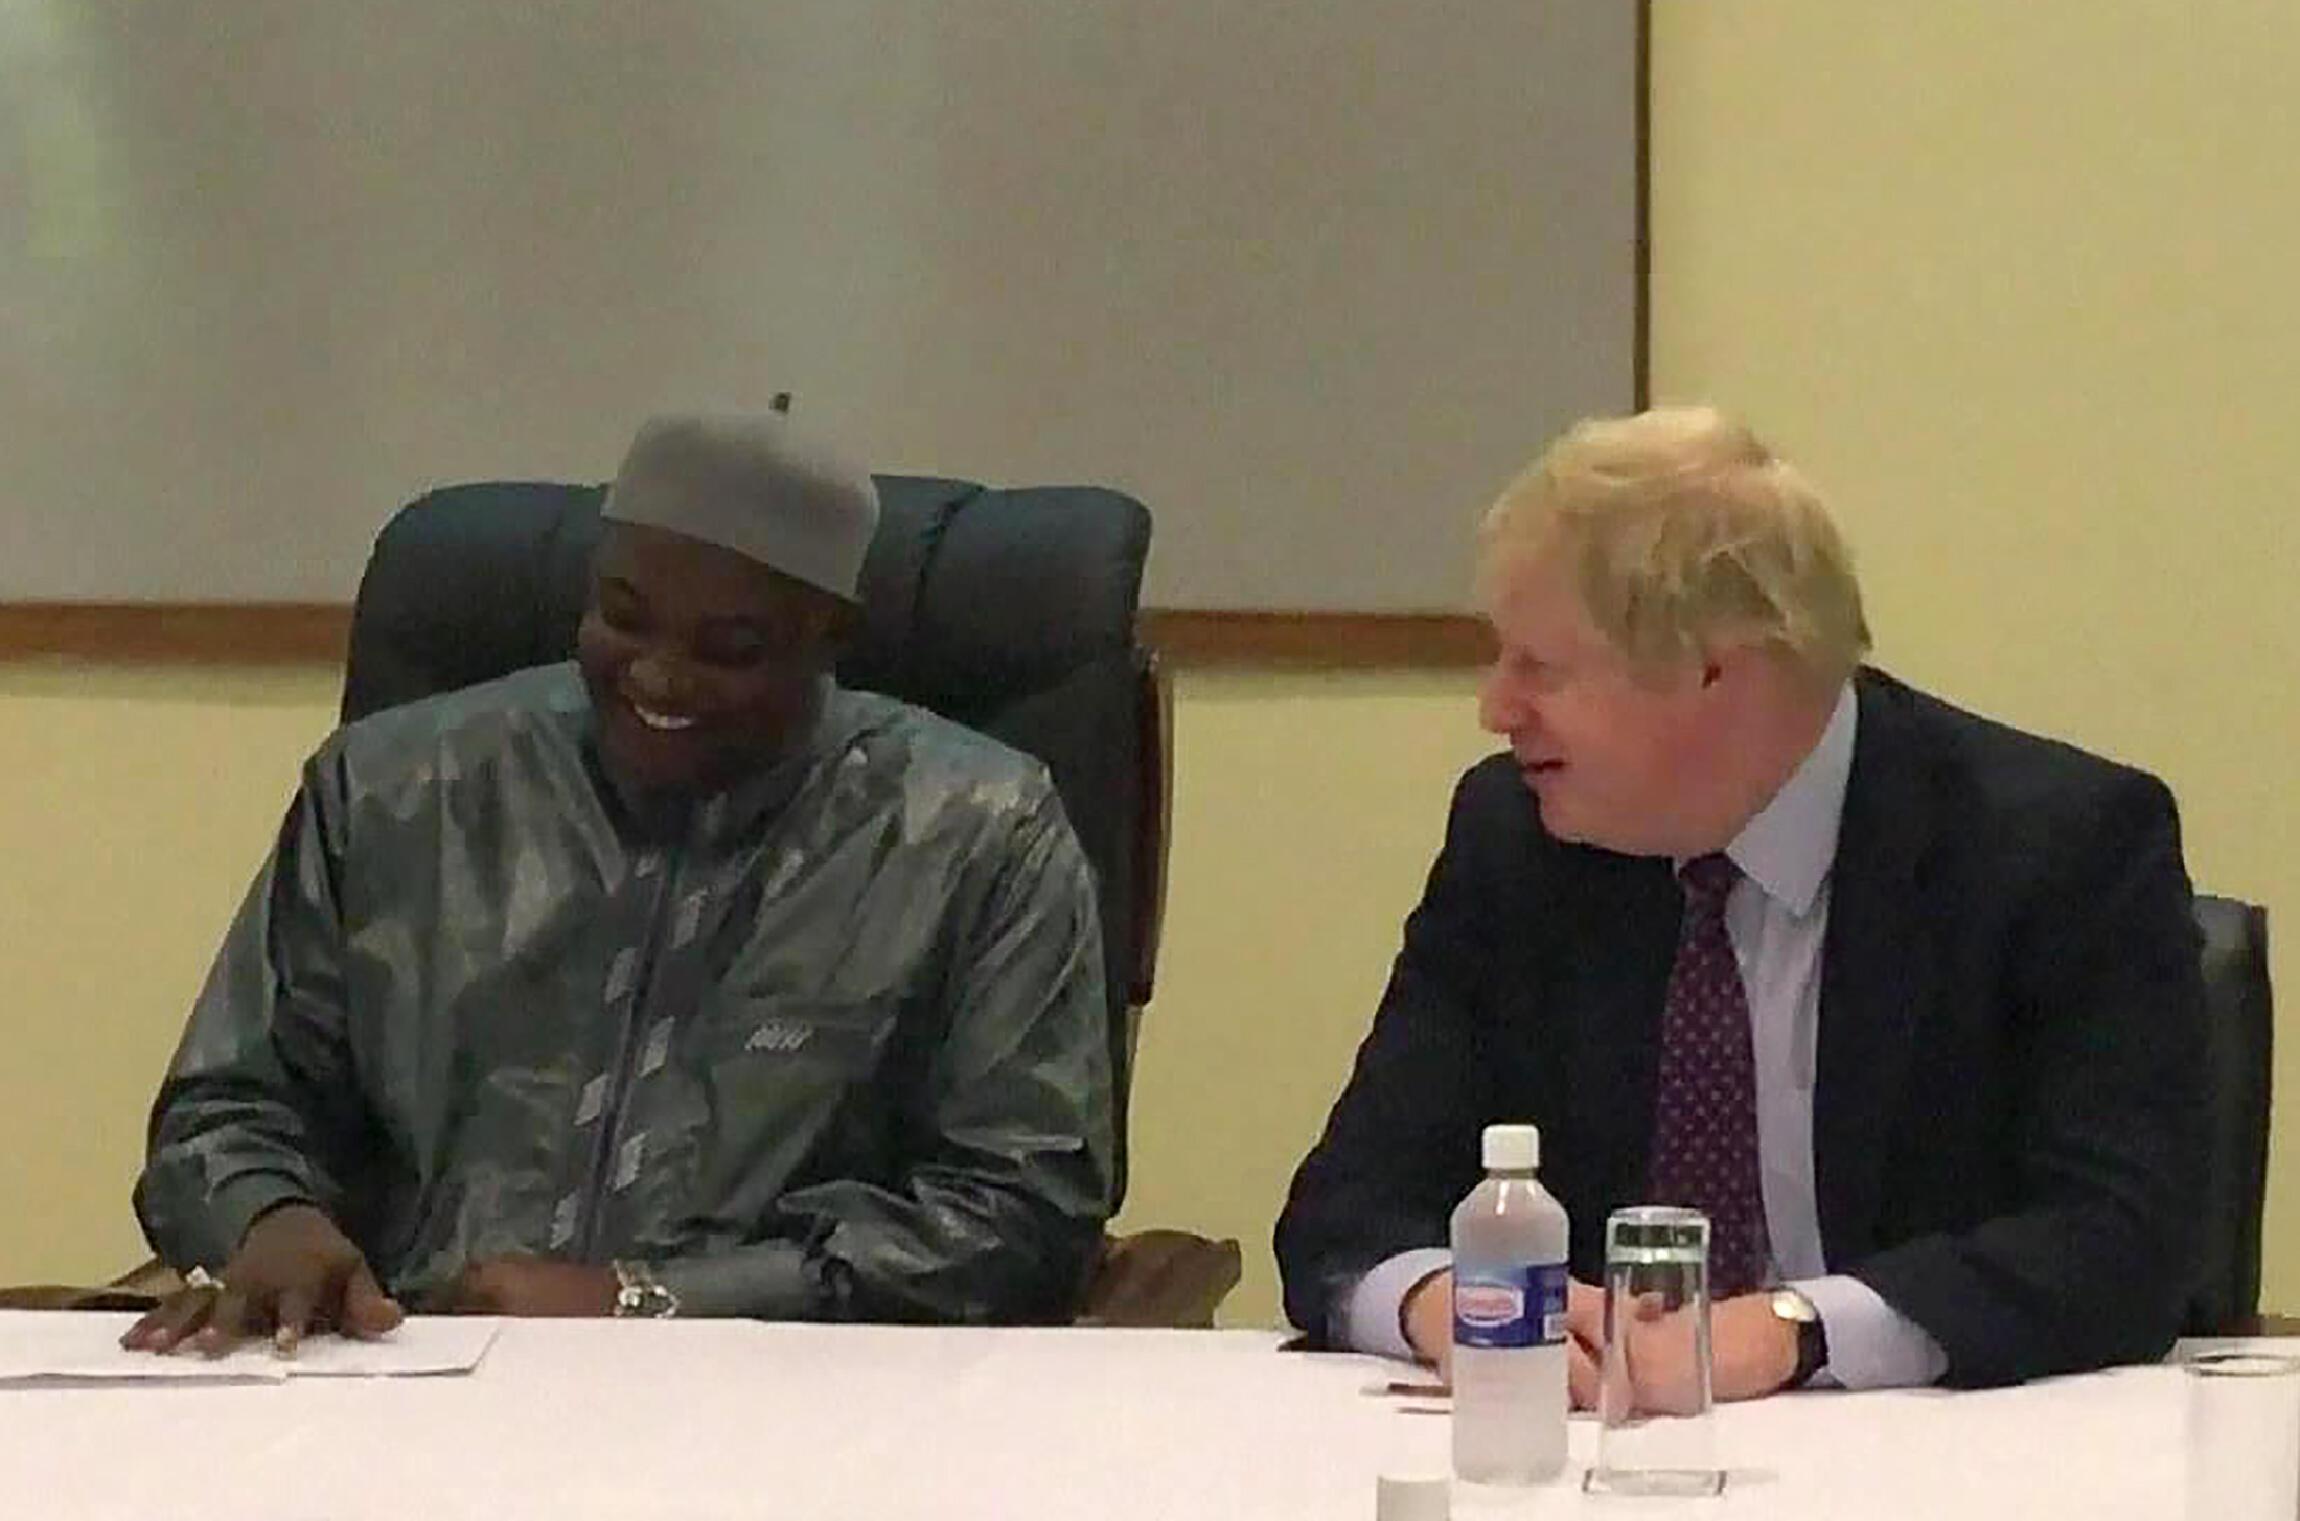 Footage of British Foreign Secretary Boris Johnson meeting Gambian President Adama Barrow in Banjul on 14 February 2017.